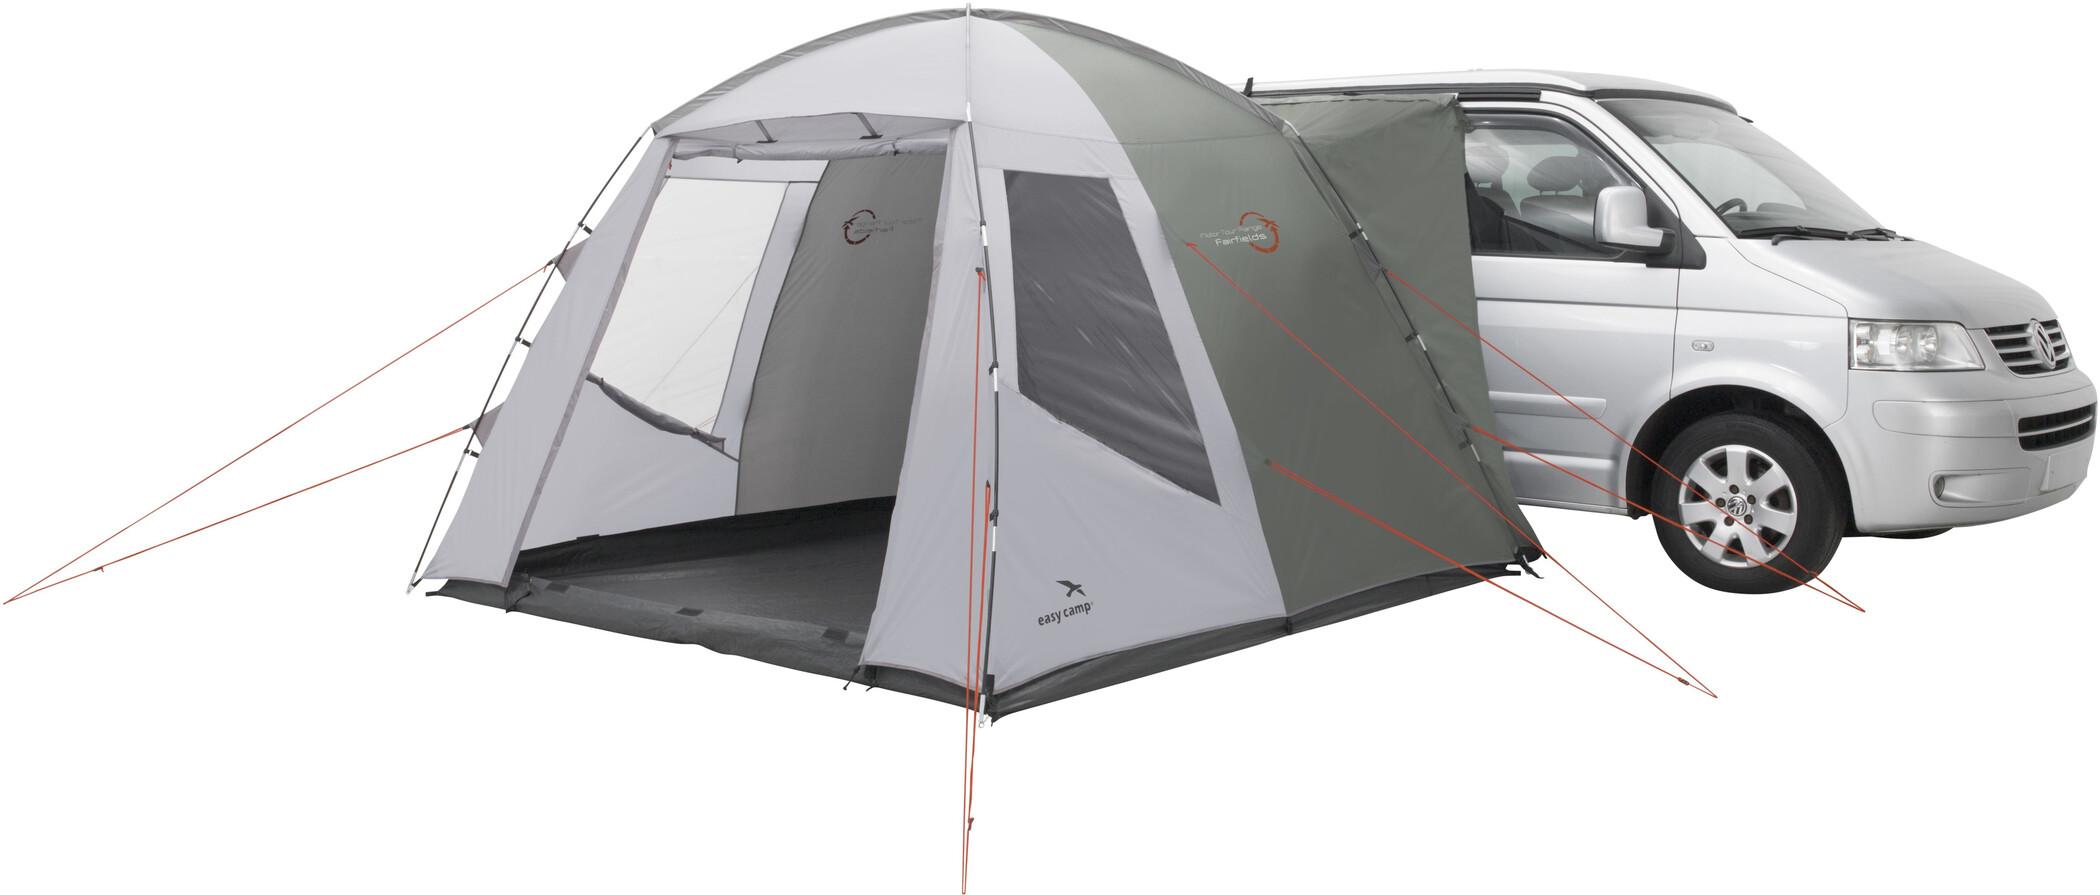 Easy Camp Fairfields Vorzelt light grey